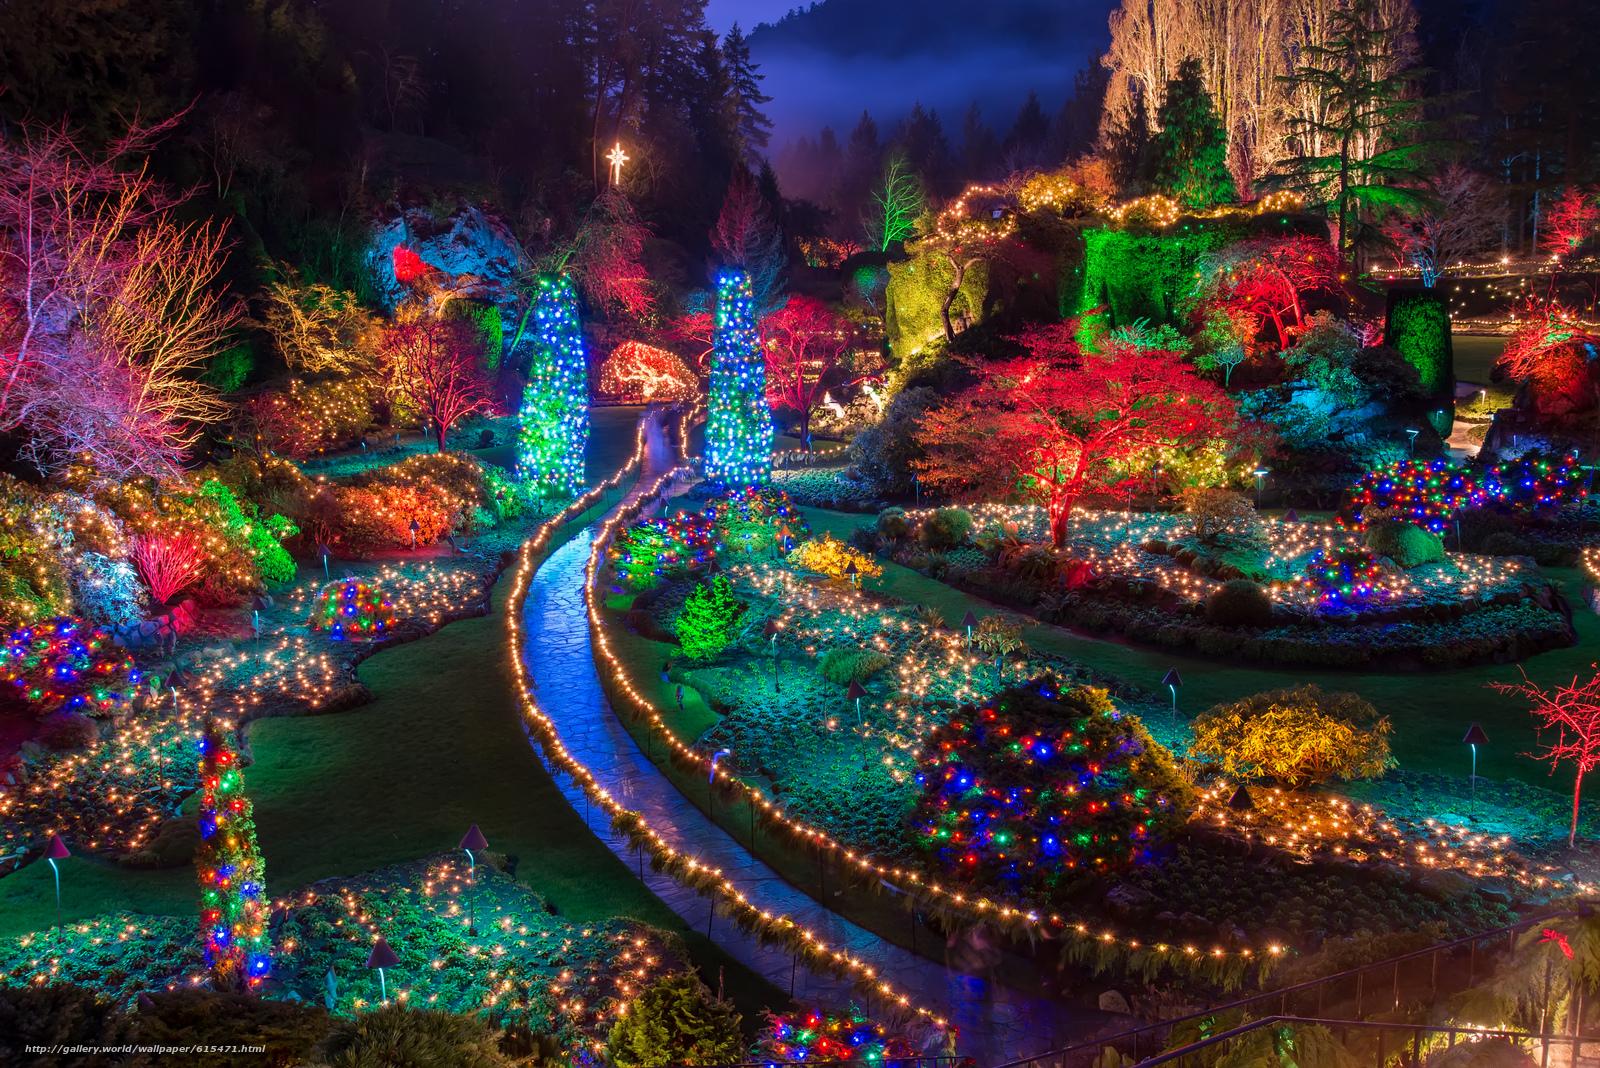 Скачать на телефон обои фото картинку на тему Buchart Gardens, Christmas Lights, Saanichton, British Columbia, Canada, разширение 6016x4016